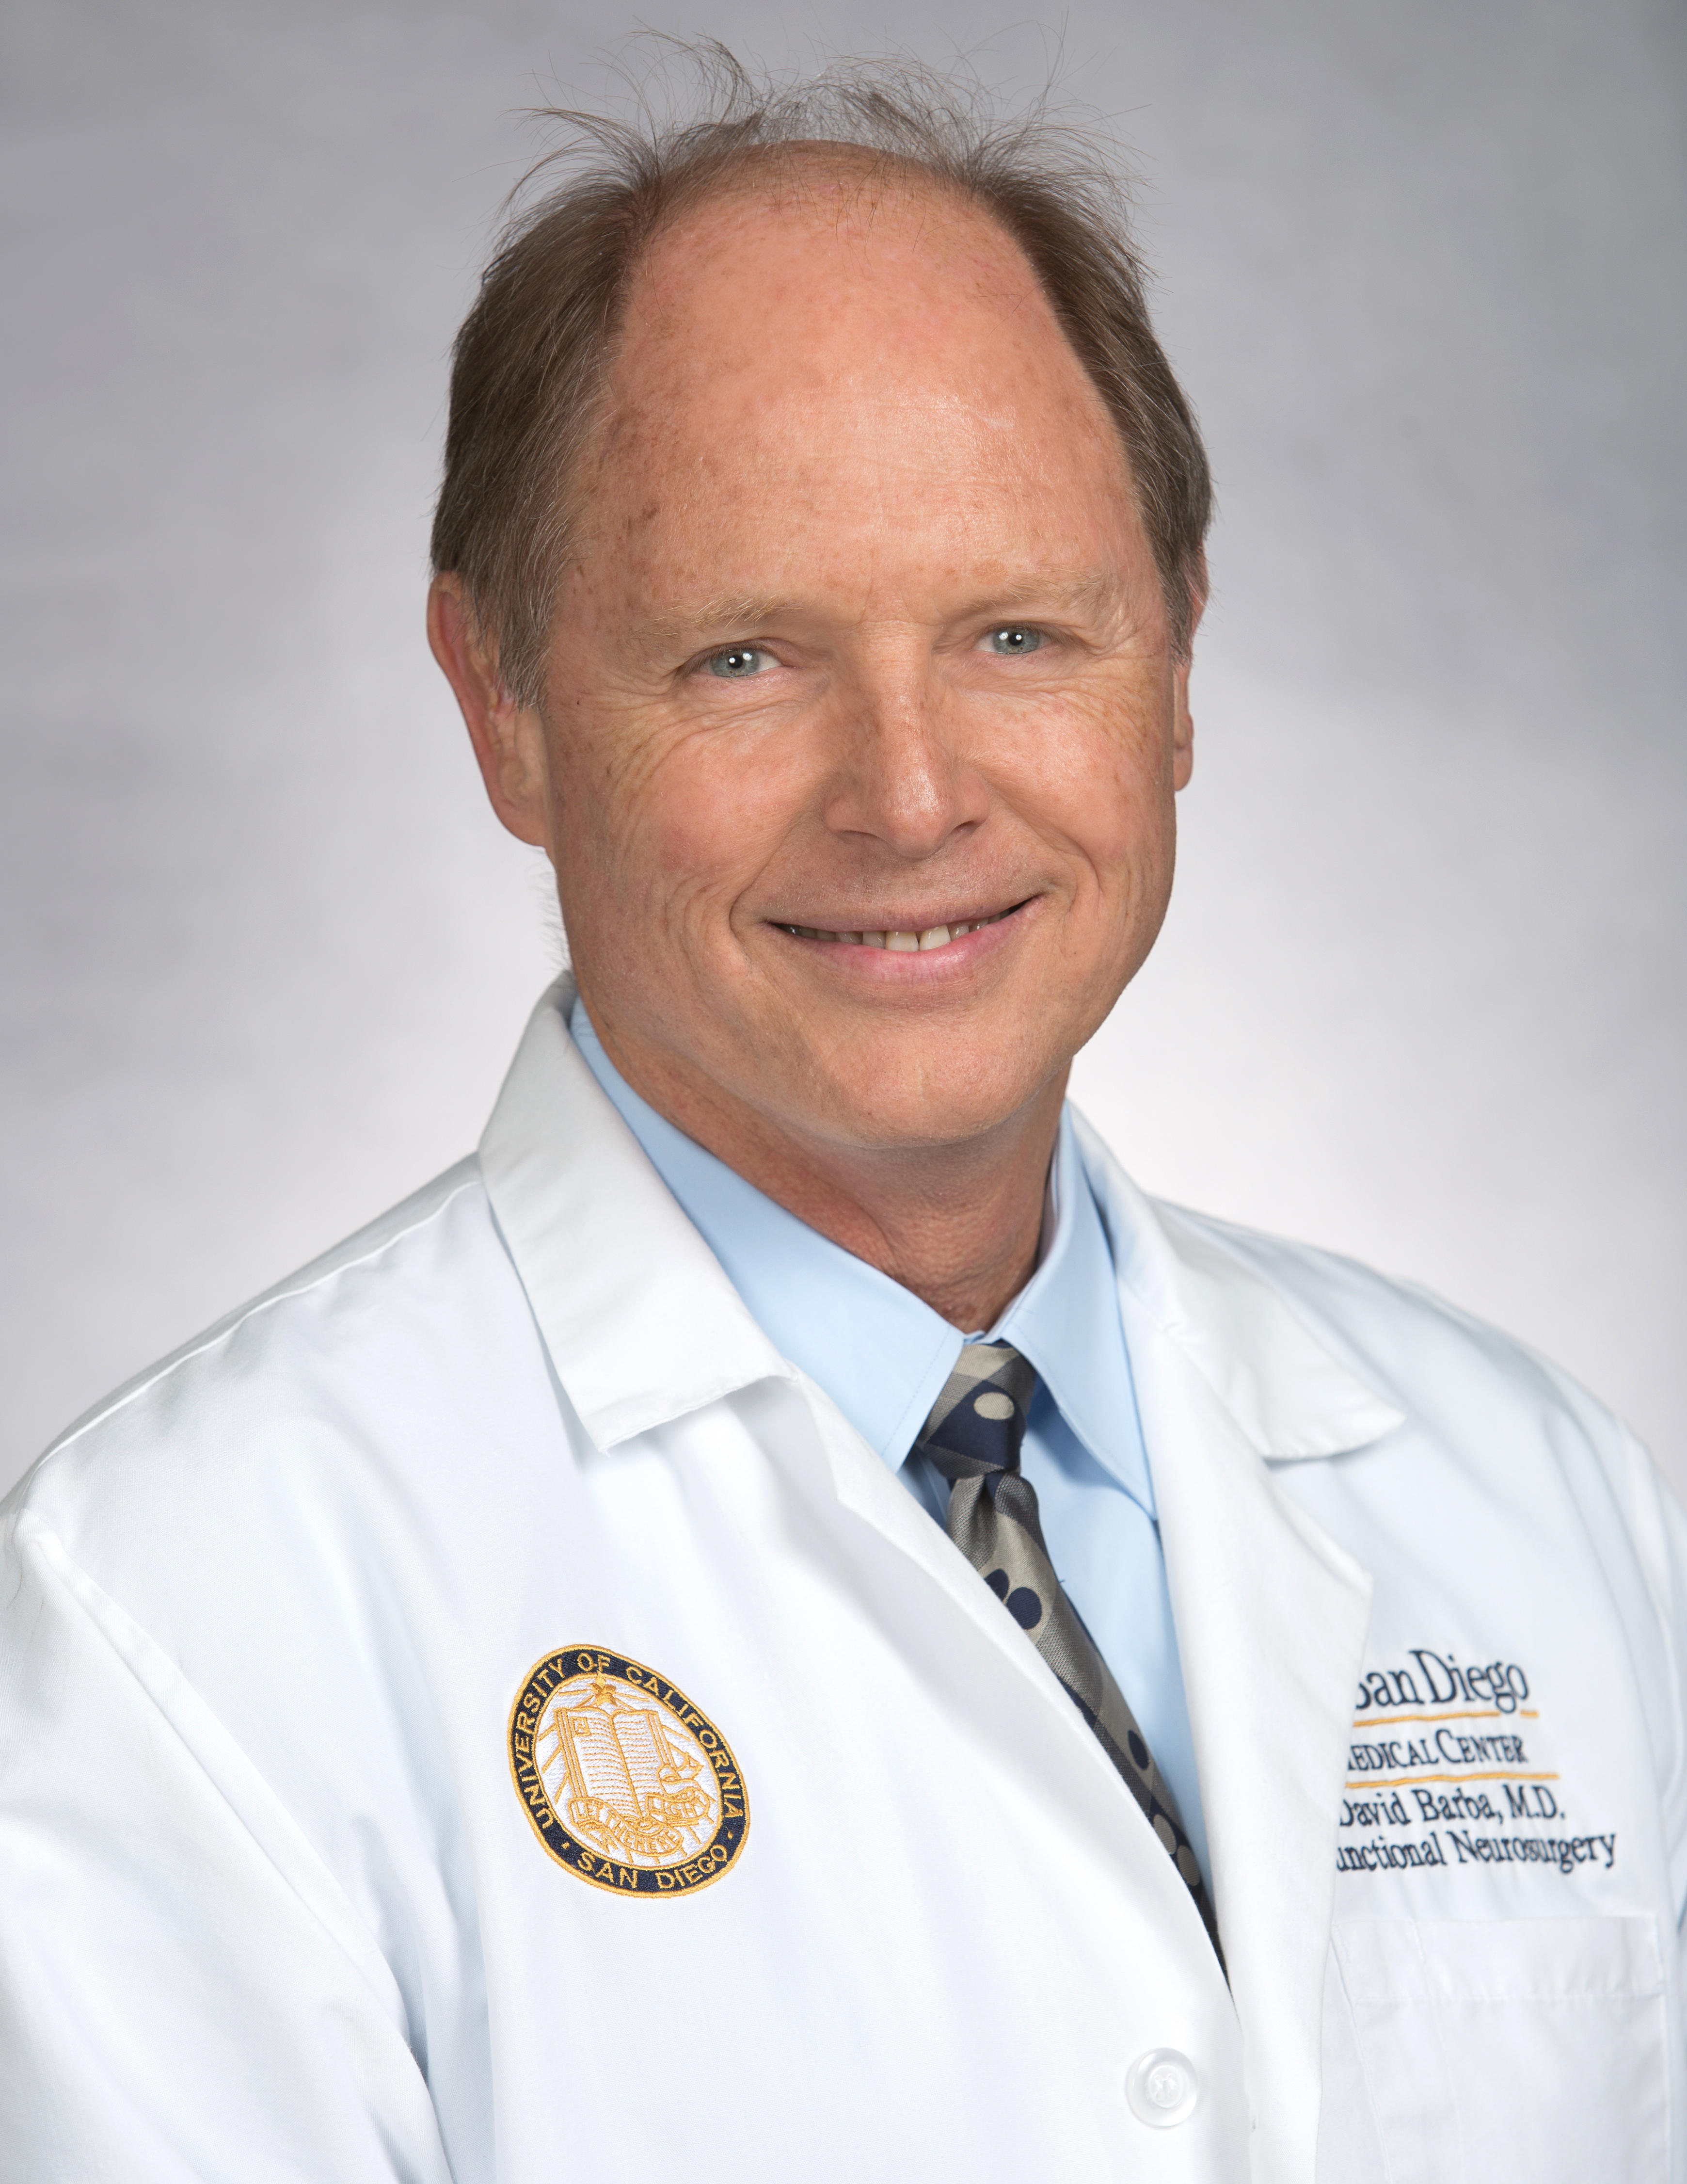 David Barba, MD